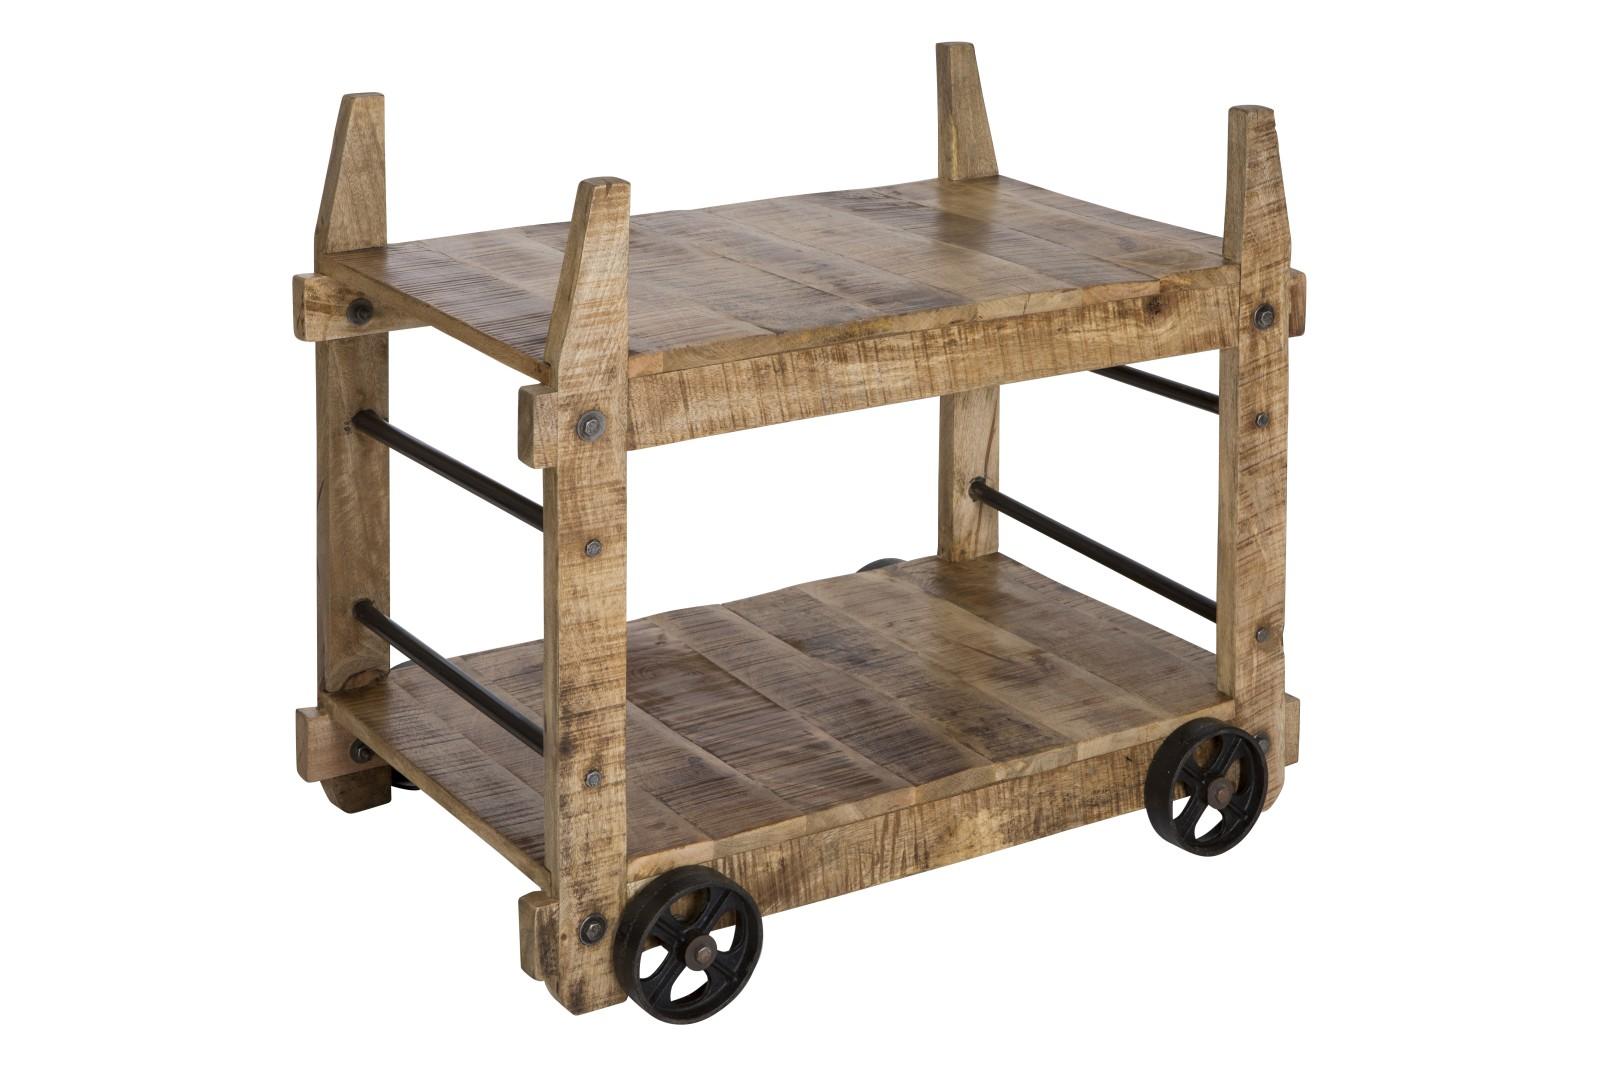 Gadu Industrial Trolley and Table